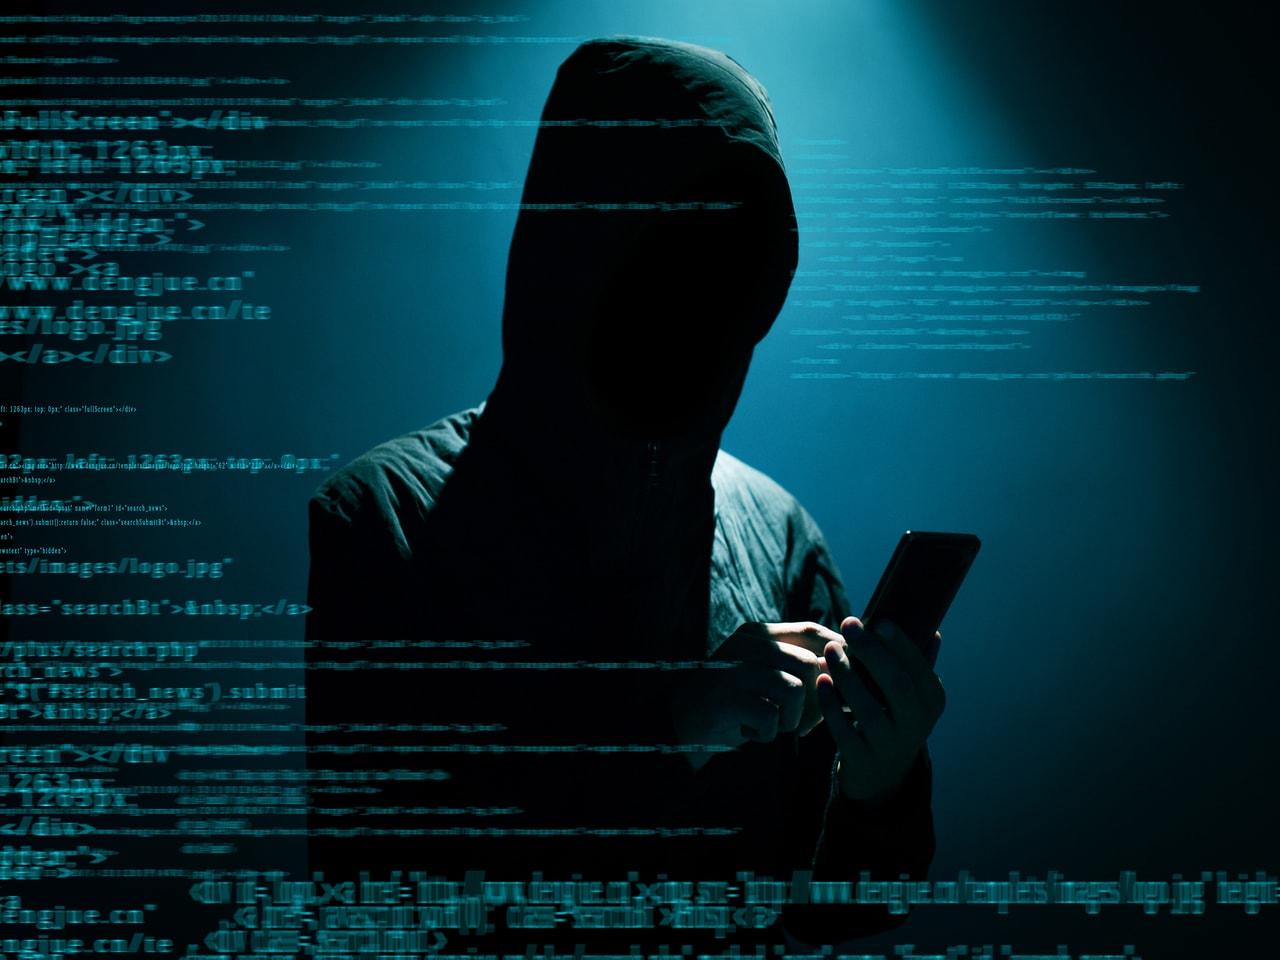 Virgin Media urges password change over hacking risk - BBC News